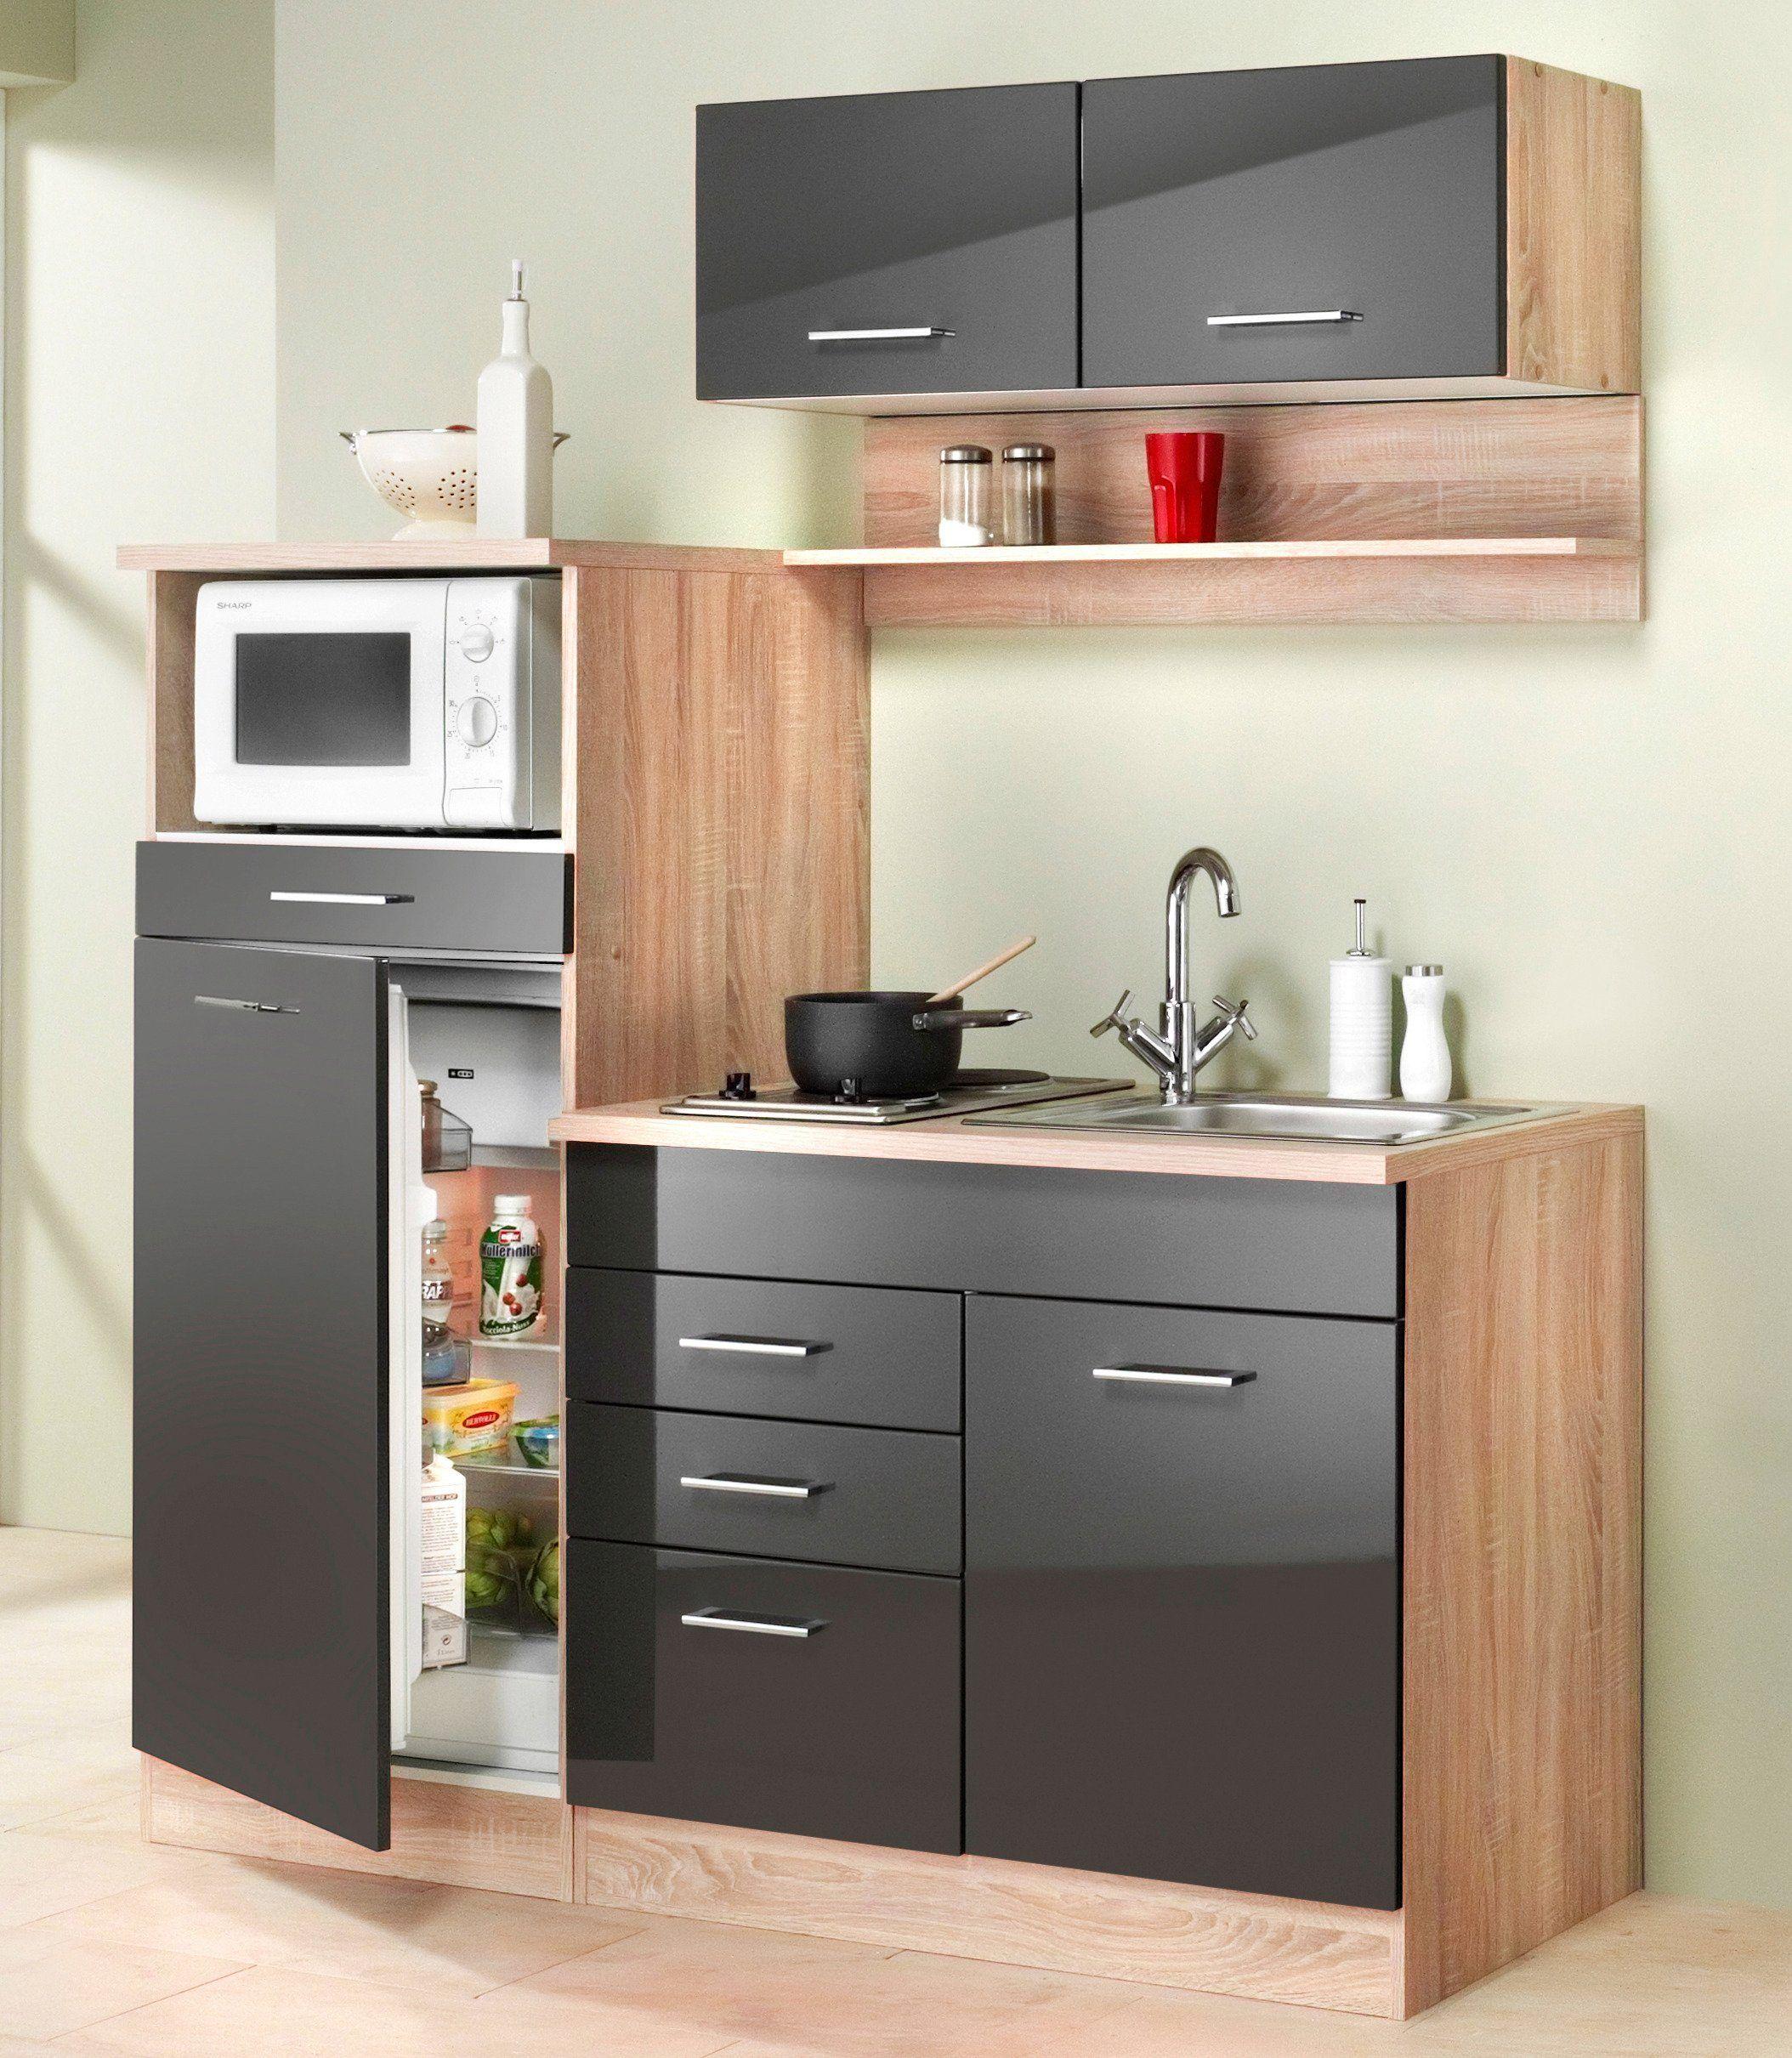 Held Mobel Held Kitchen Cabinets Small Kitchen Renovations Kitchen Design Small Kitchen Cabinet Design